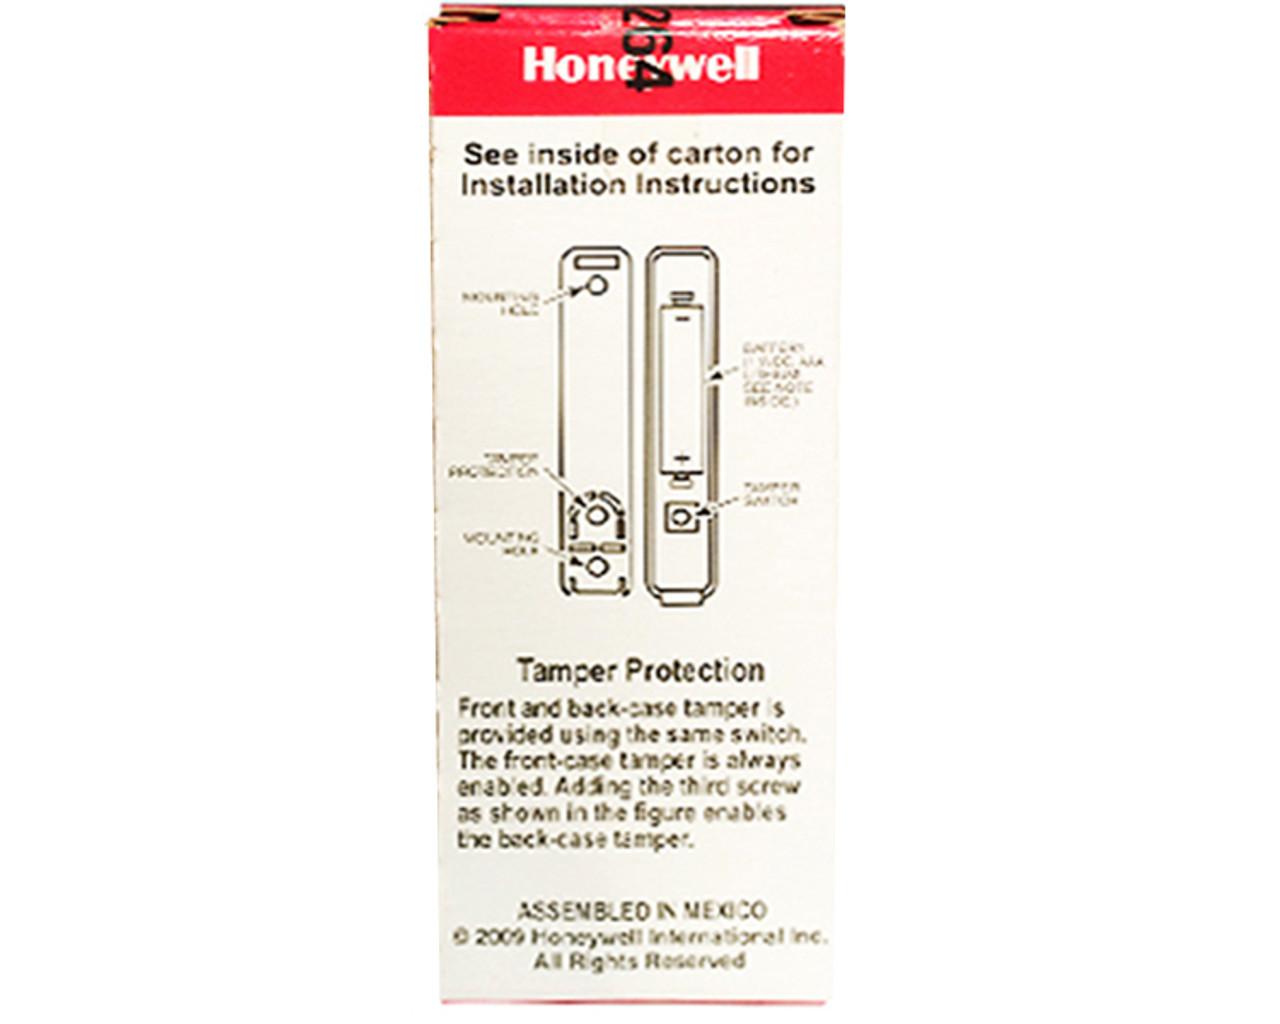 Honeywell 5820L Slim Line Transmitter